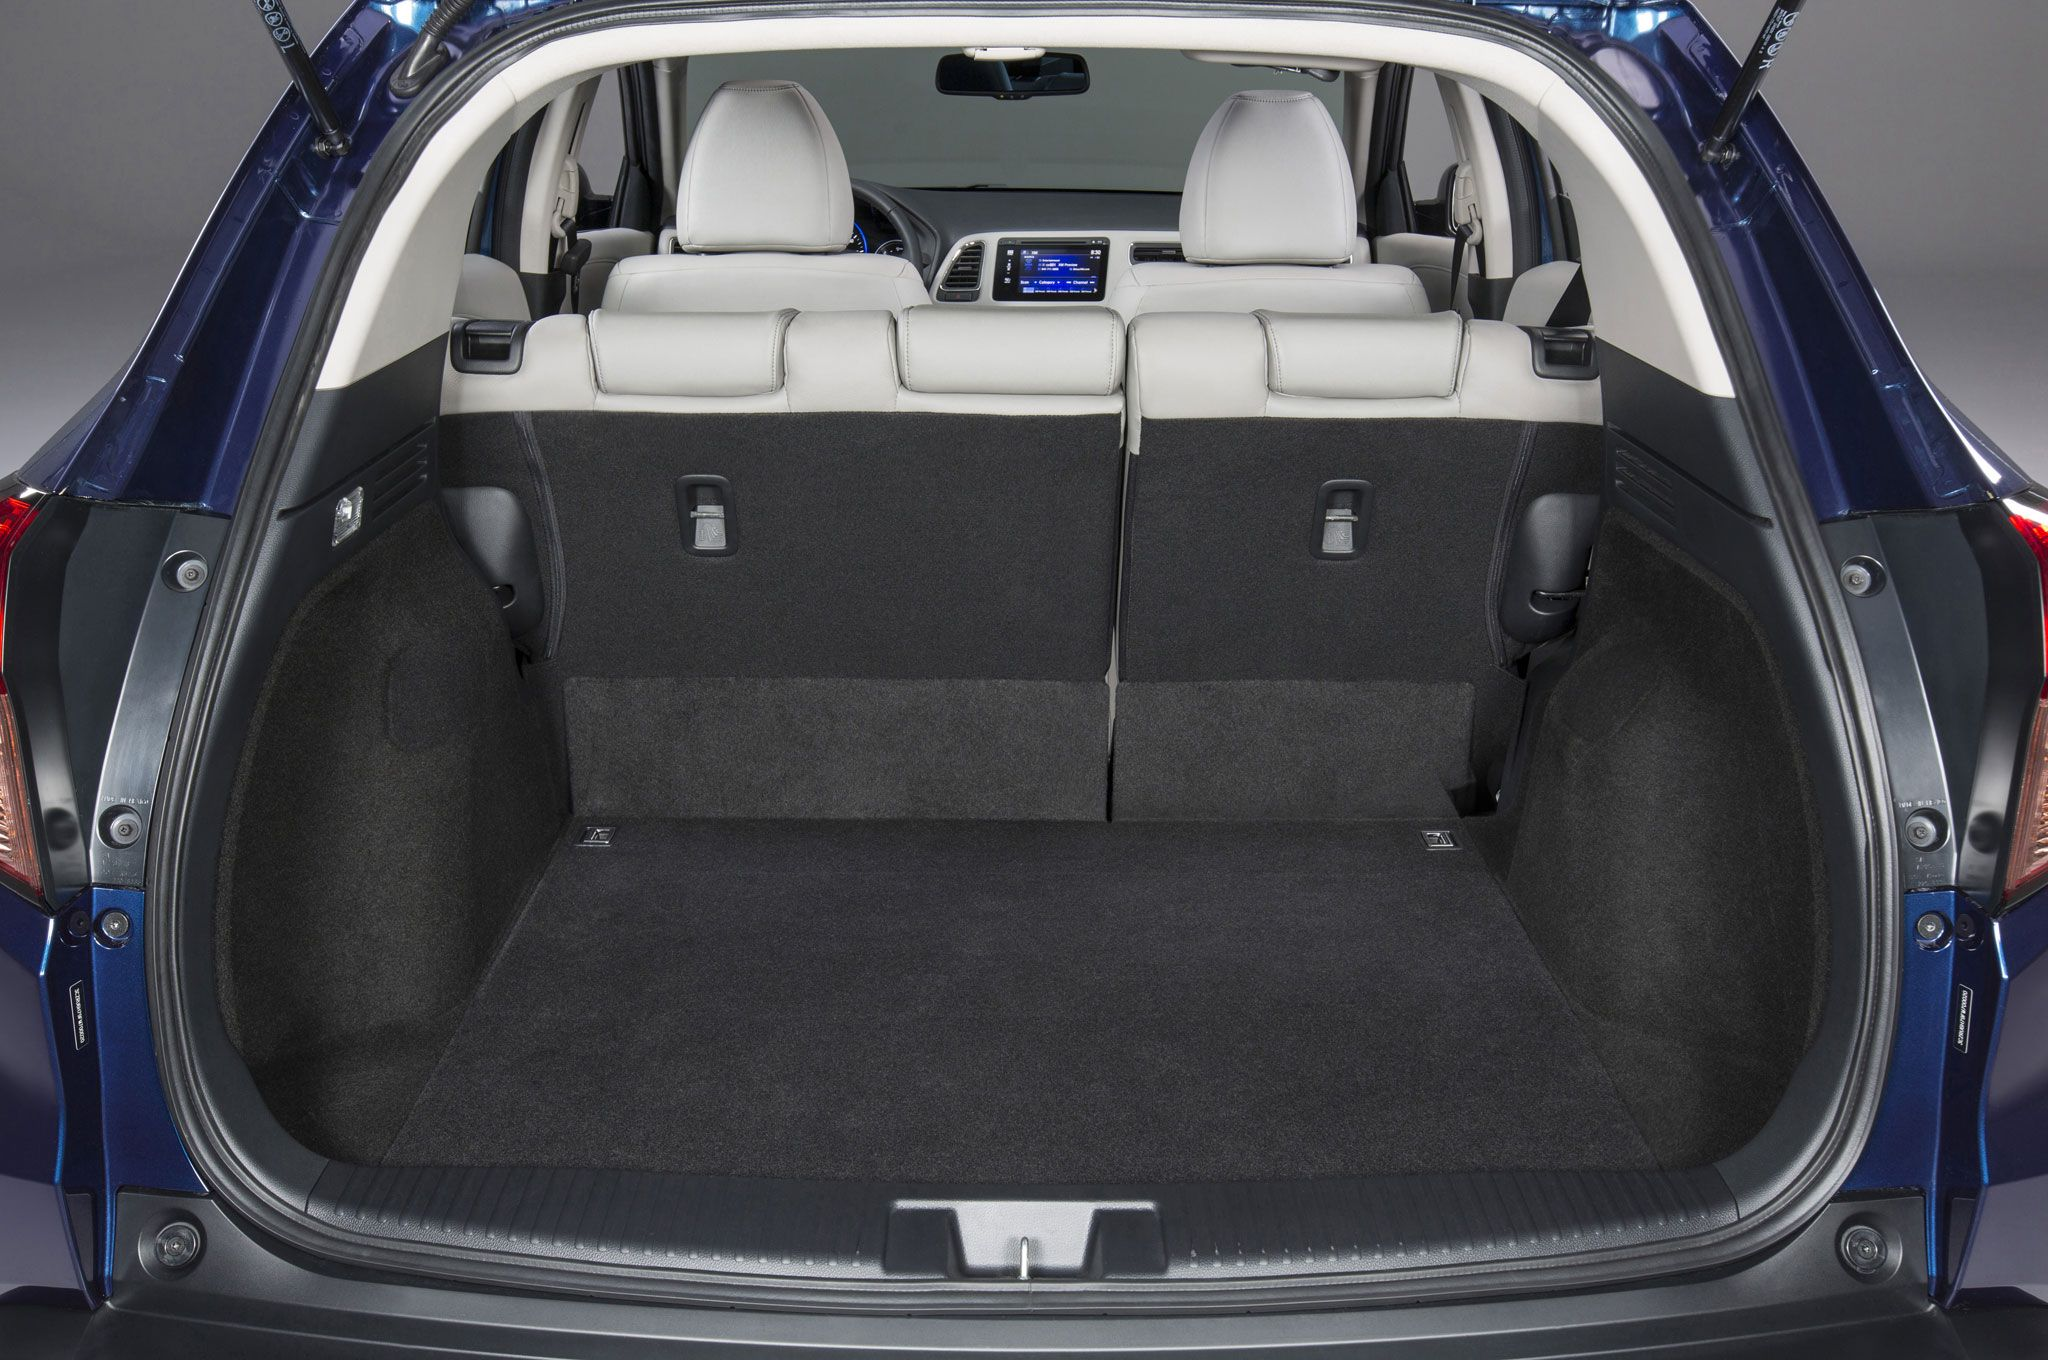 2016 honda hrv cargo space coches